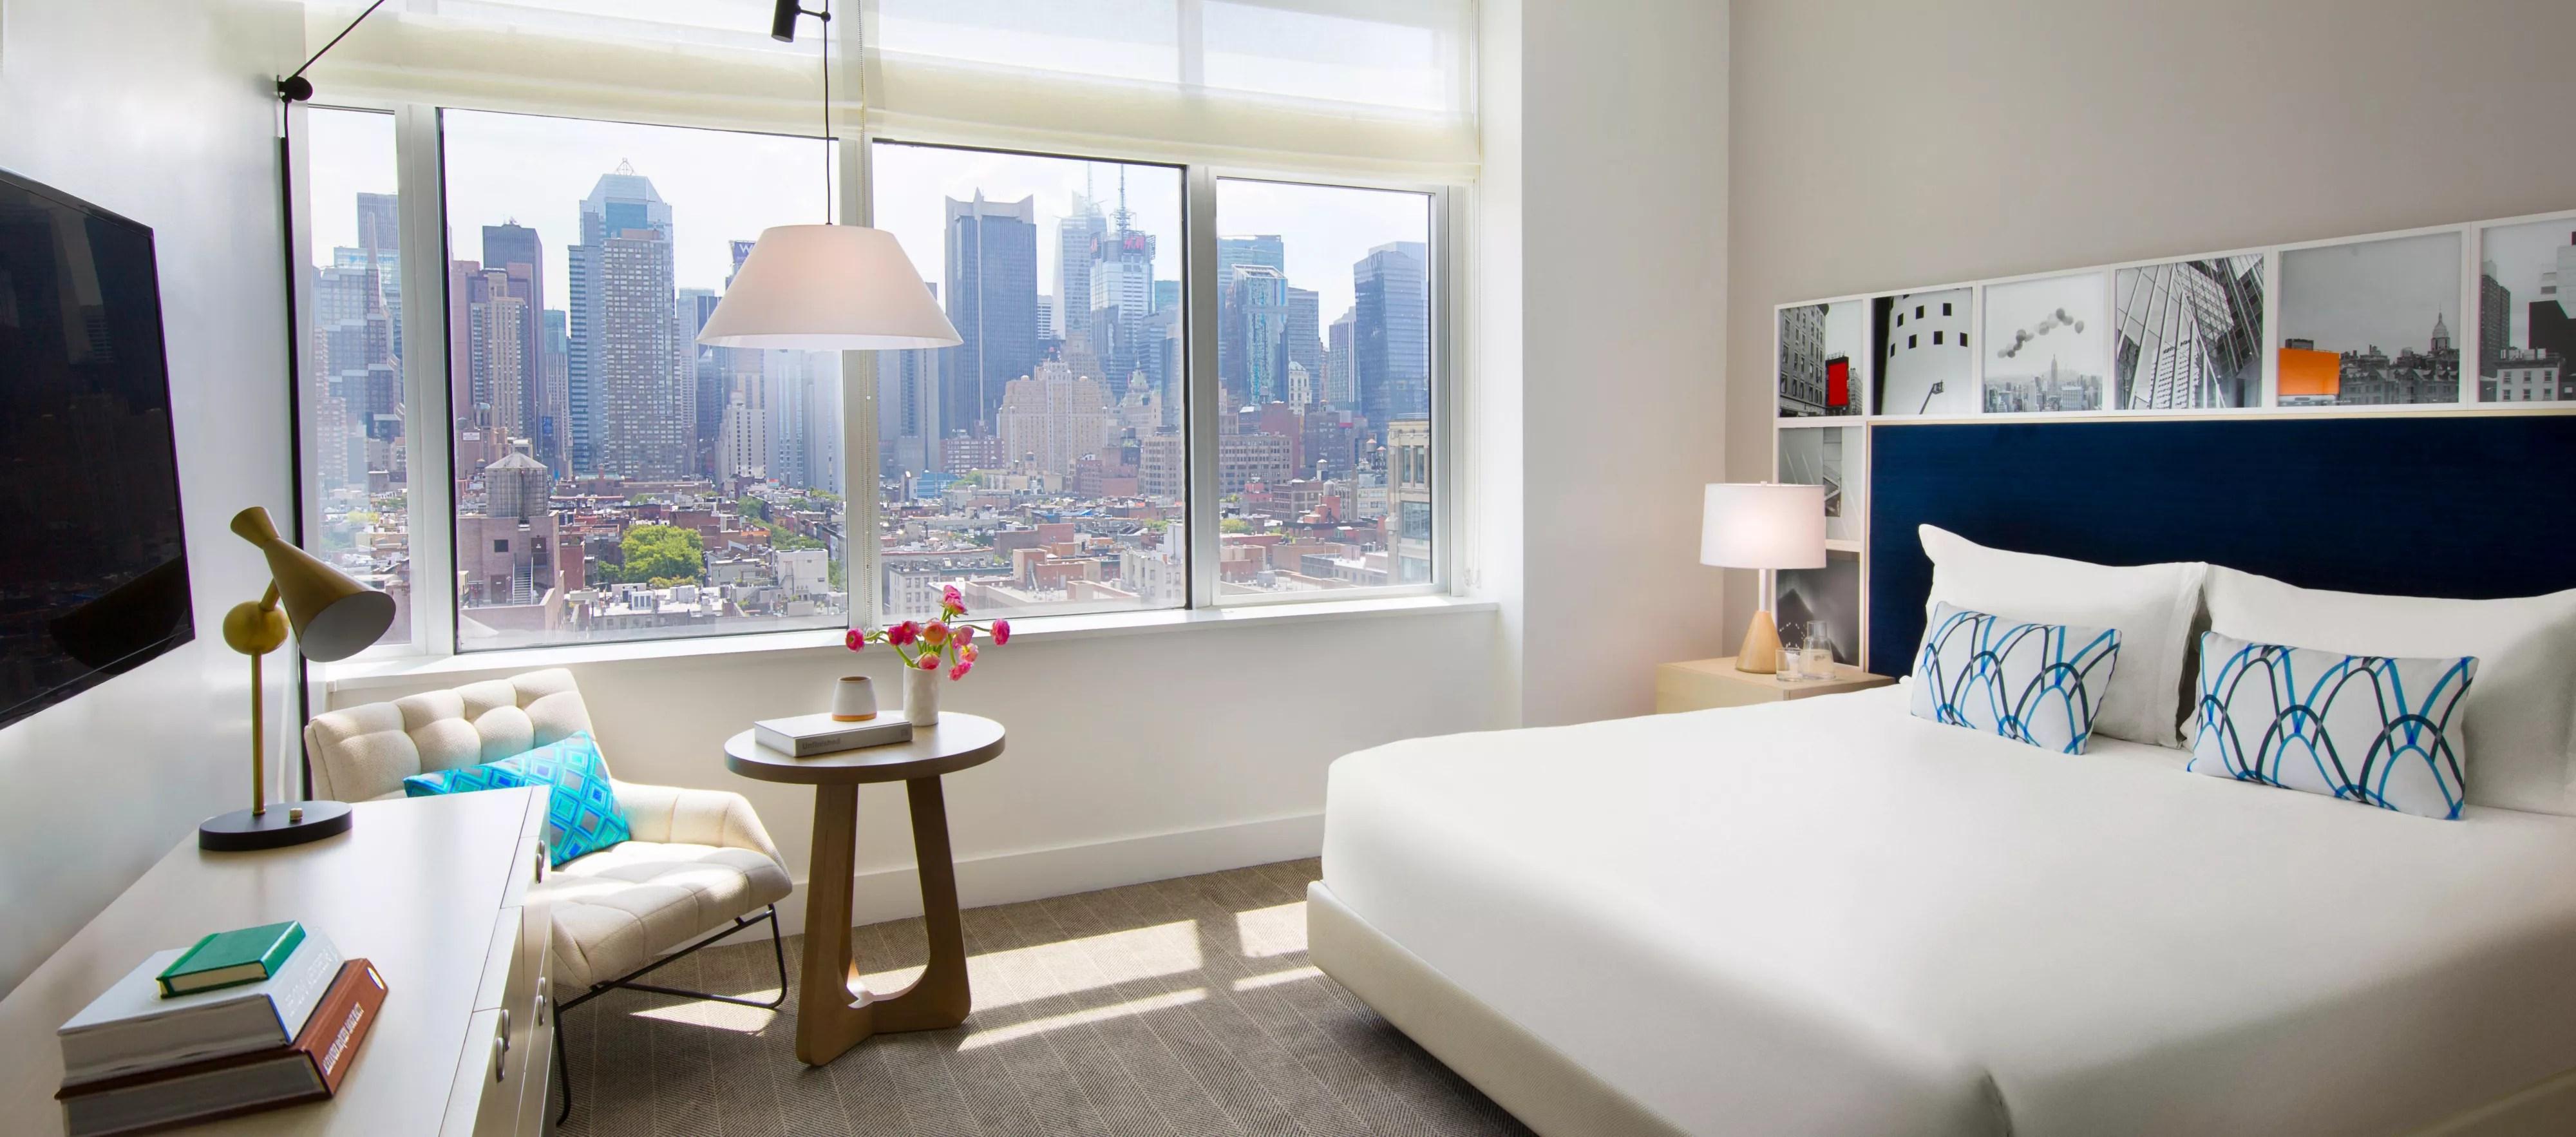 hotel with kitchen new york contemporary backsplash ink 48 2018 world 39s best hotels